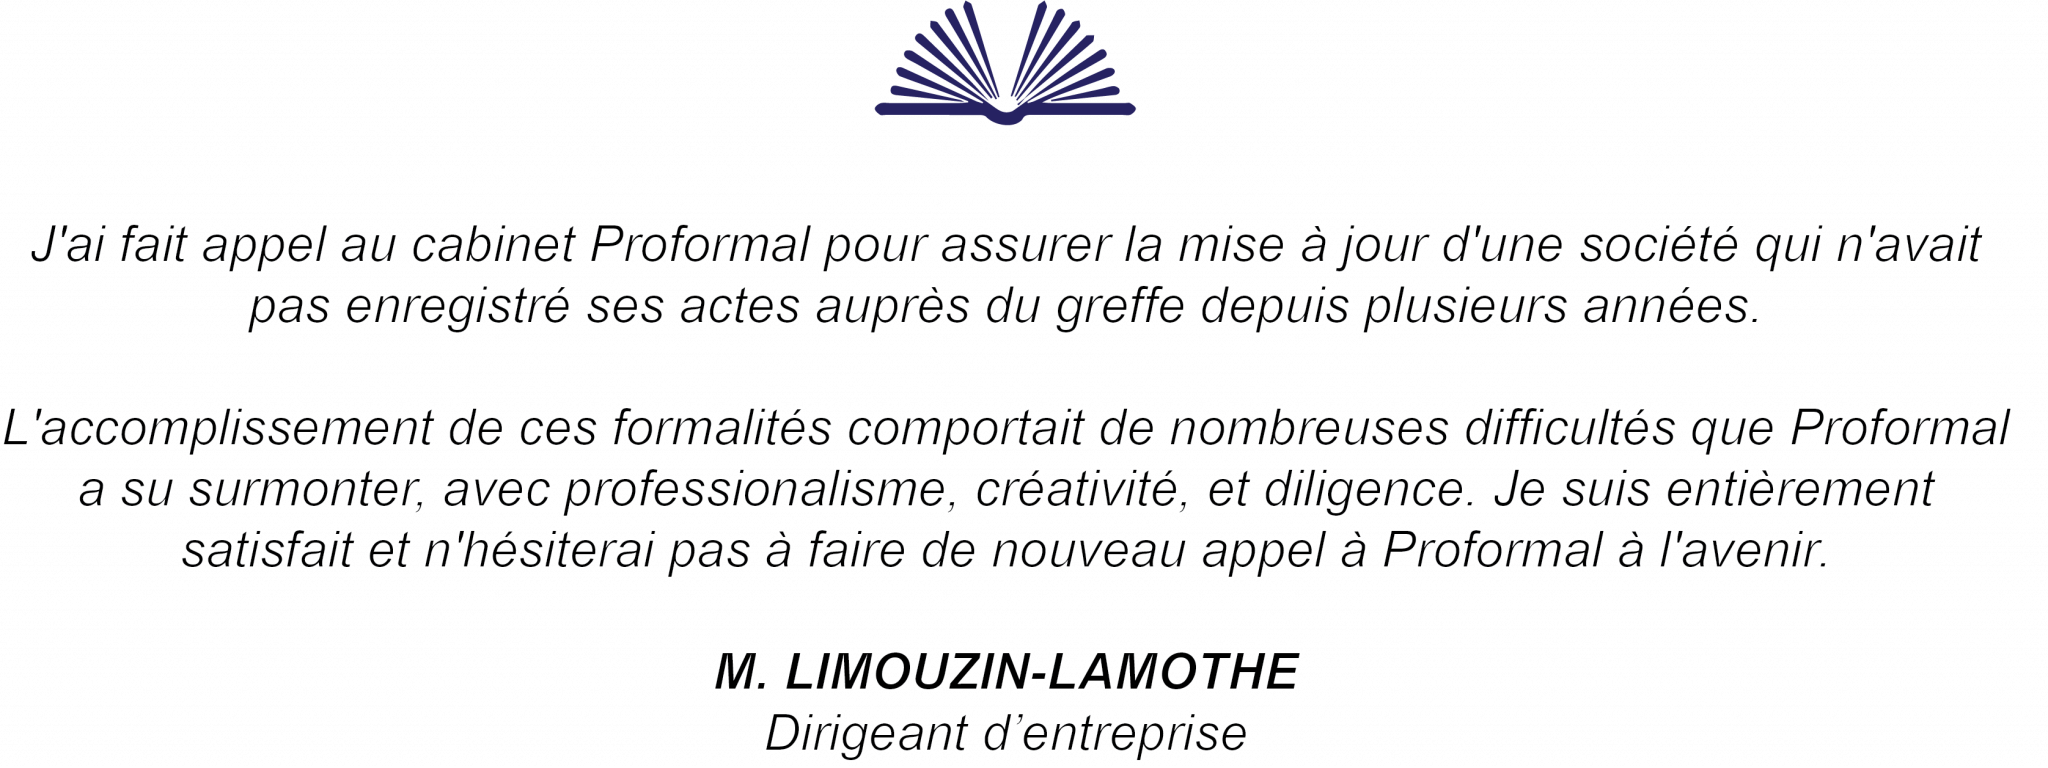 témoignage de m. Limouzin-Lamothe